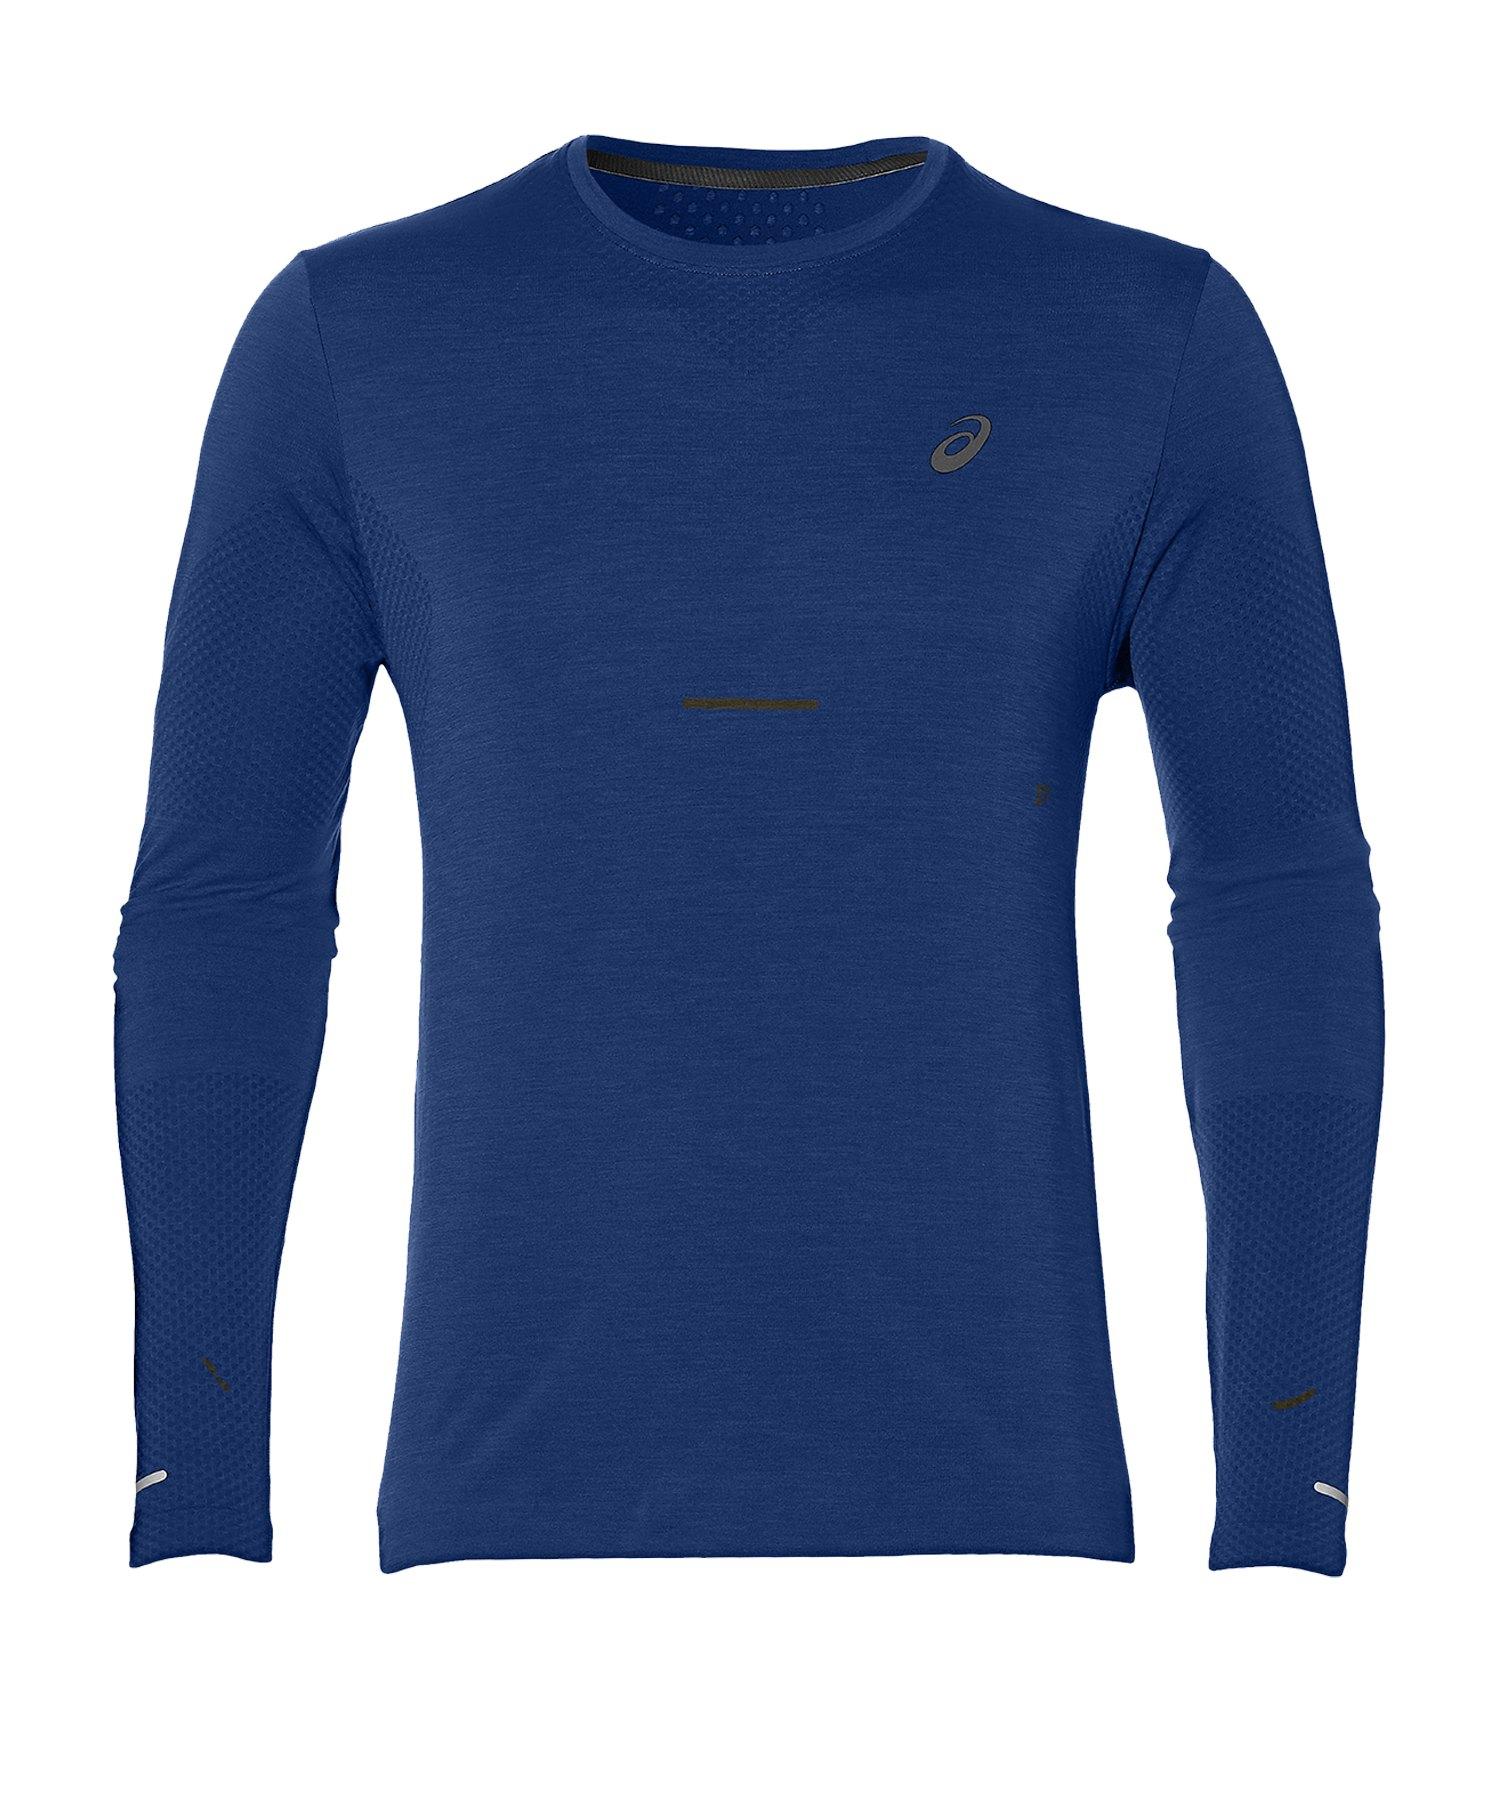 Asics Seamless LS Shirt Running Blau F404 - blau